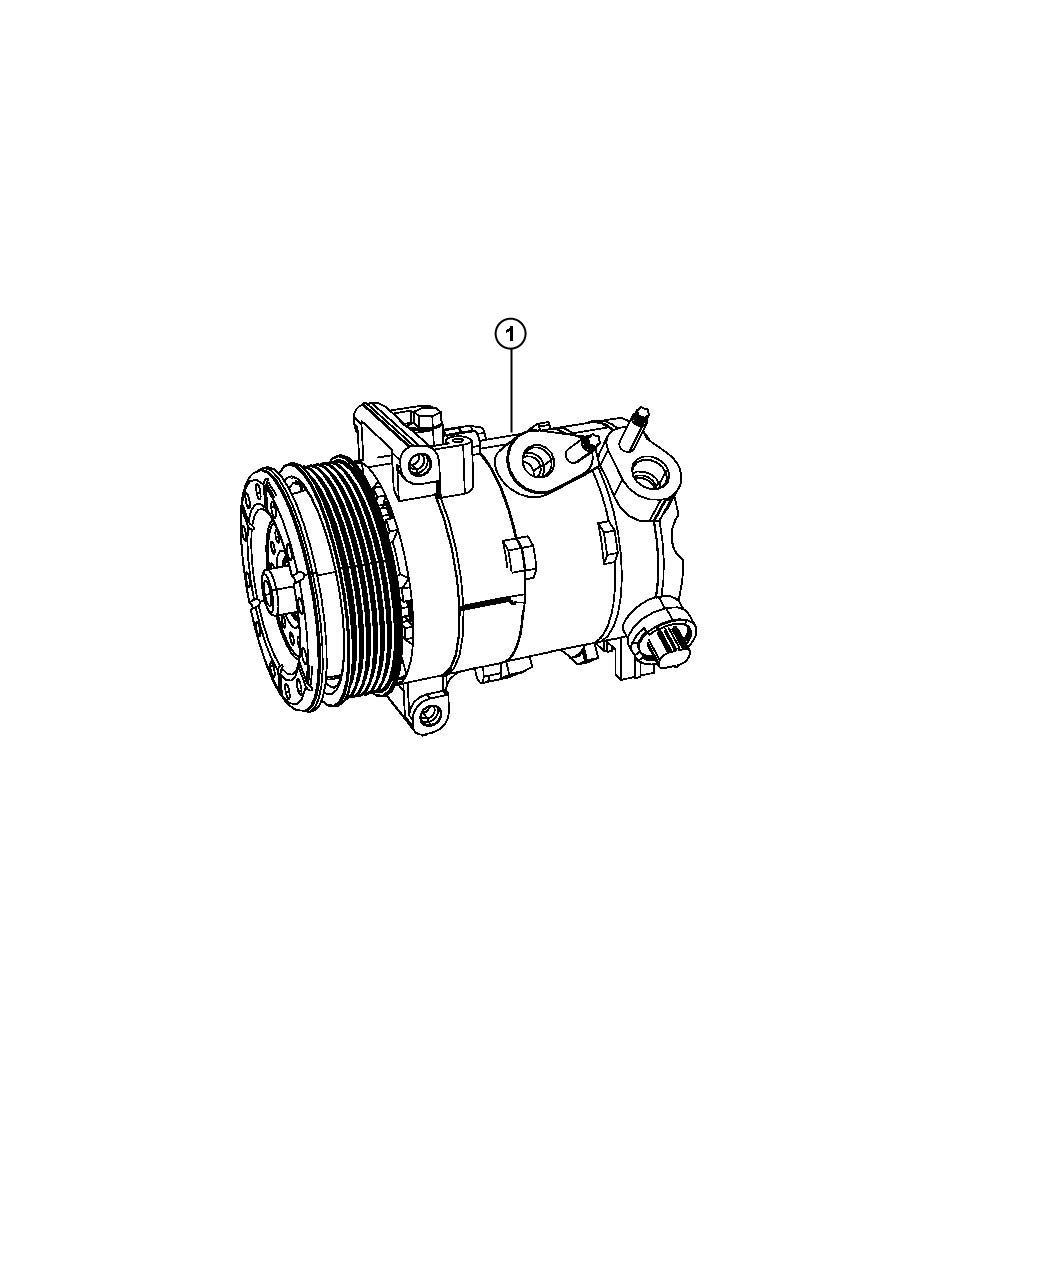 Chrysler Sebring Compressor Air Conditioning Control